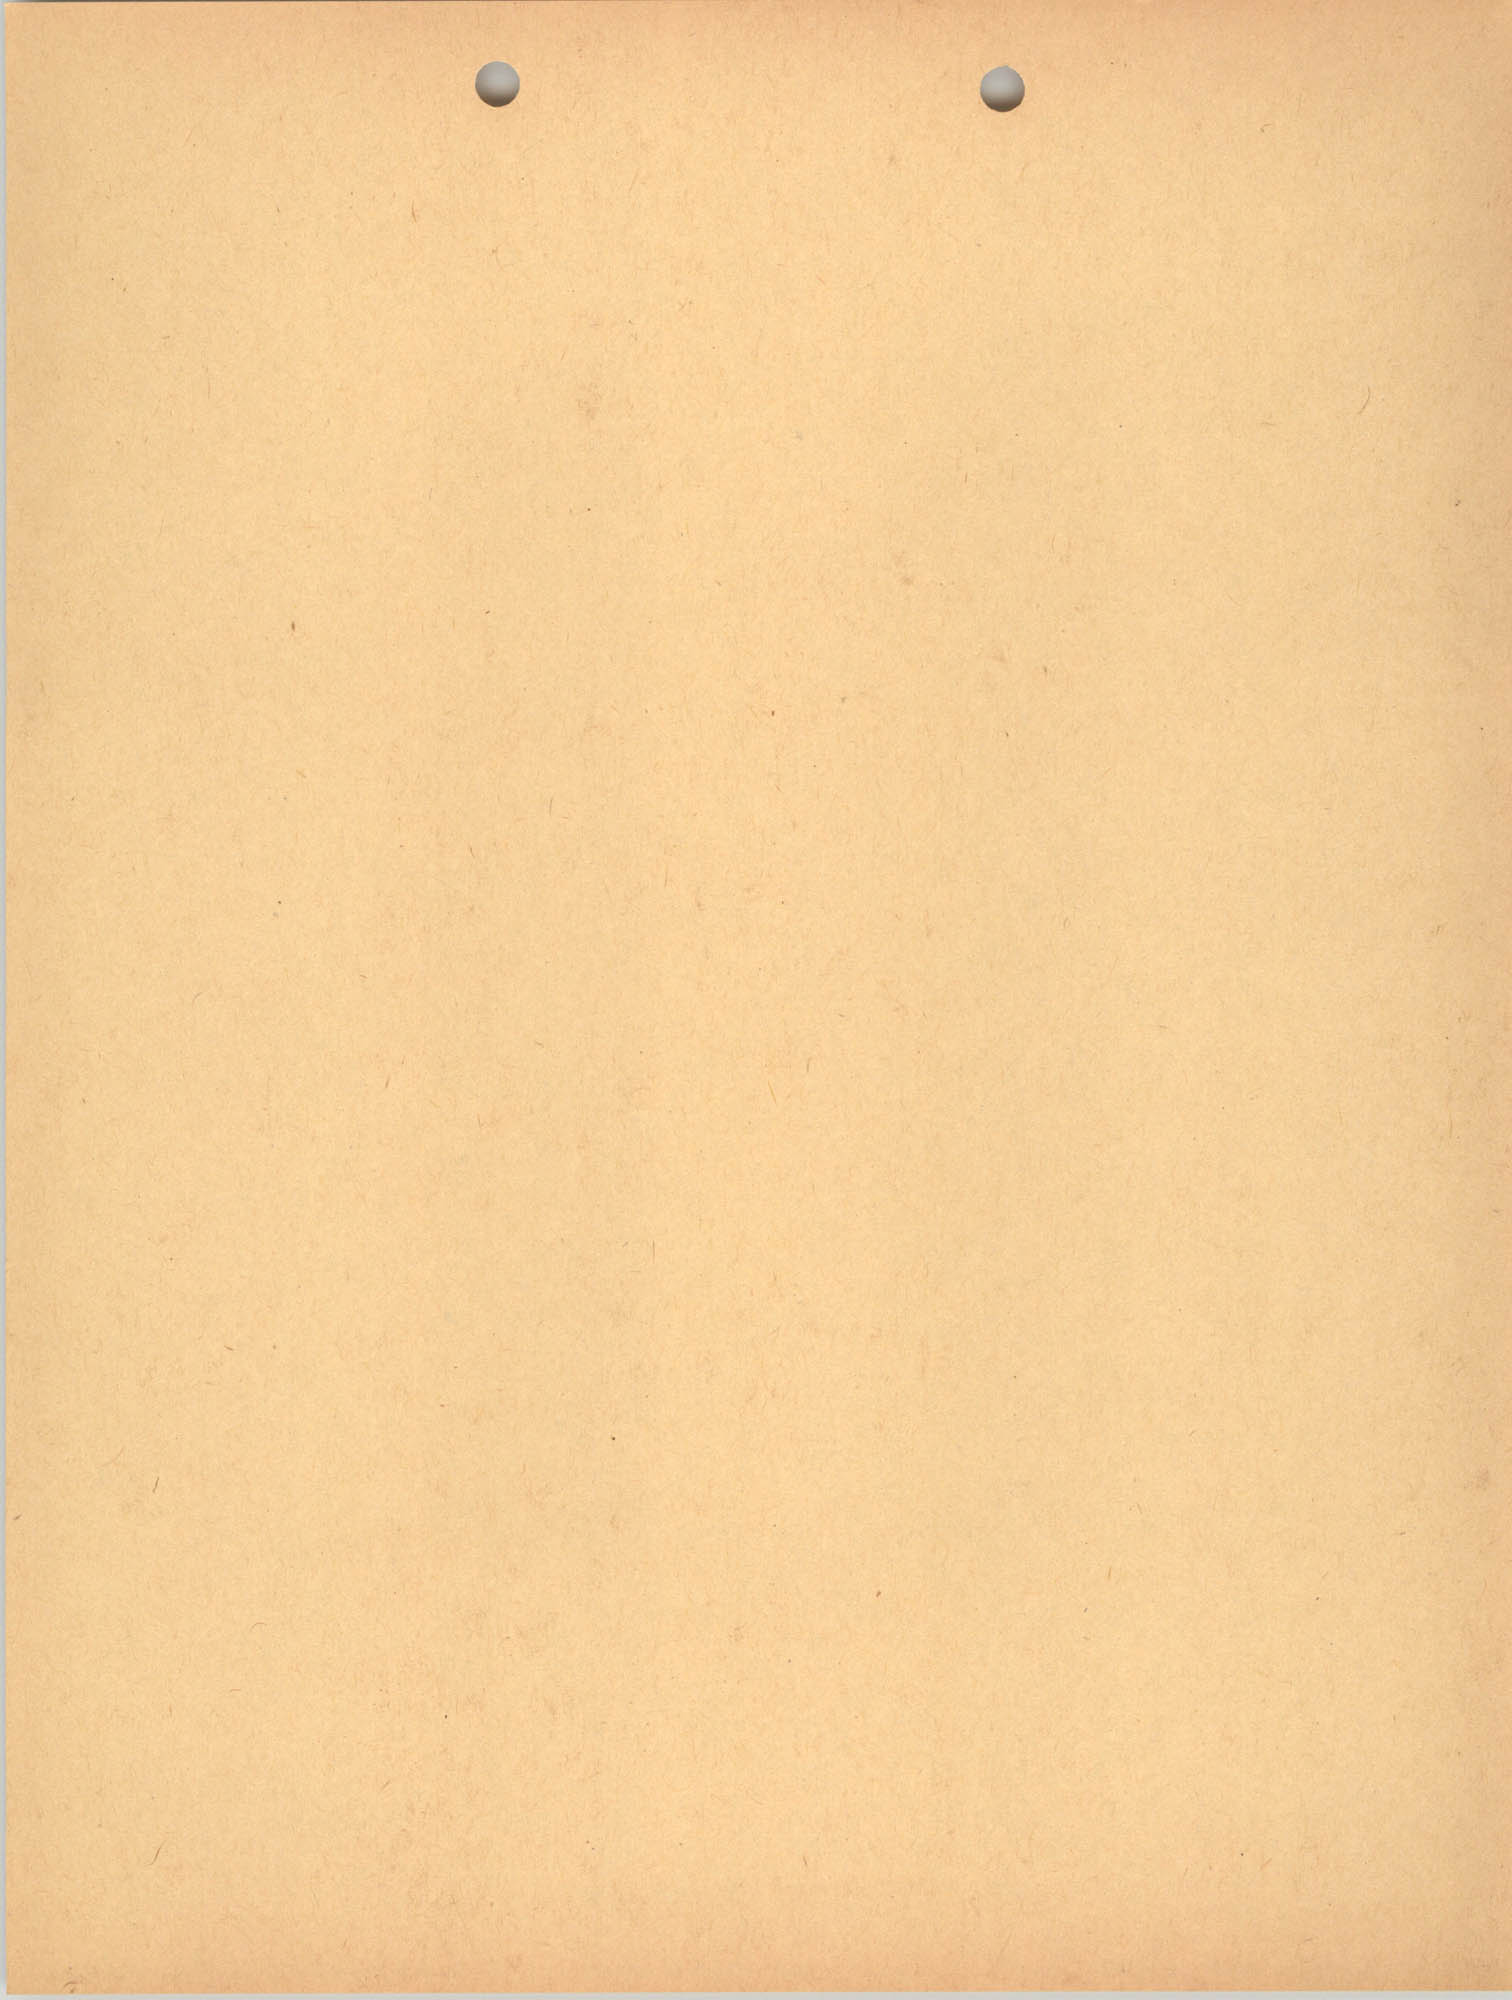 Blank Orange Page